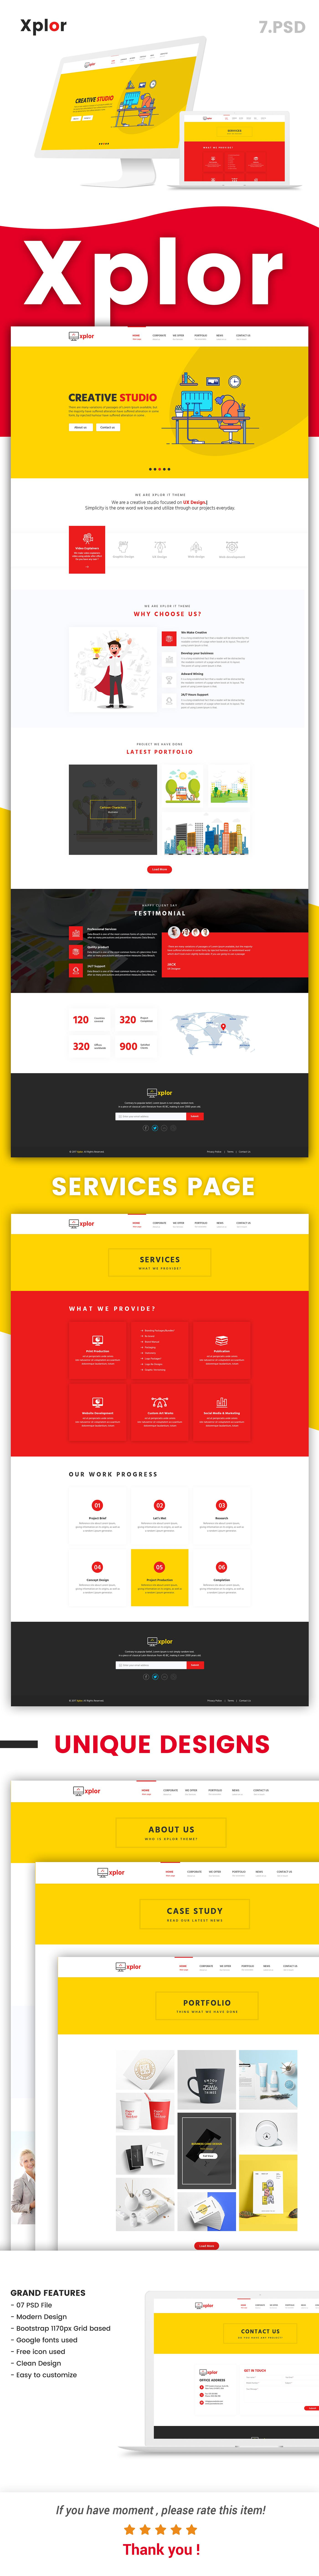 Xplor - Creative Agency PSD Template - 1